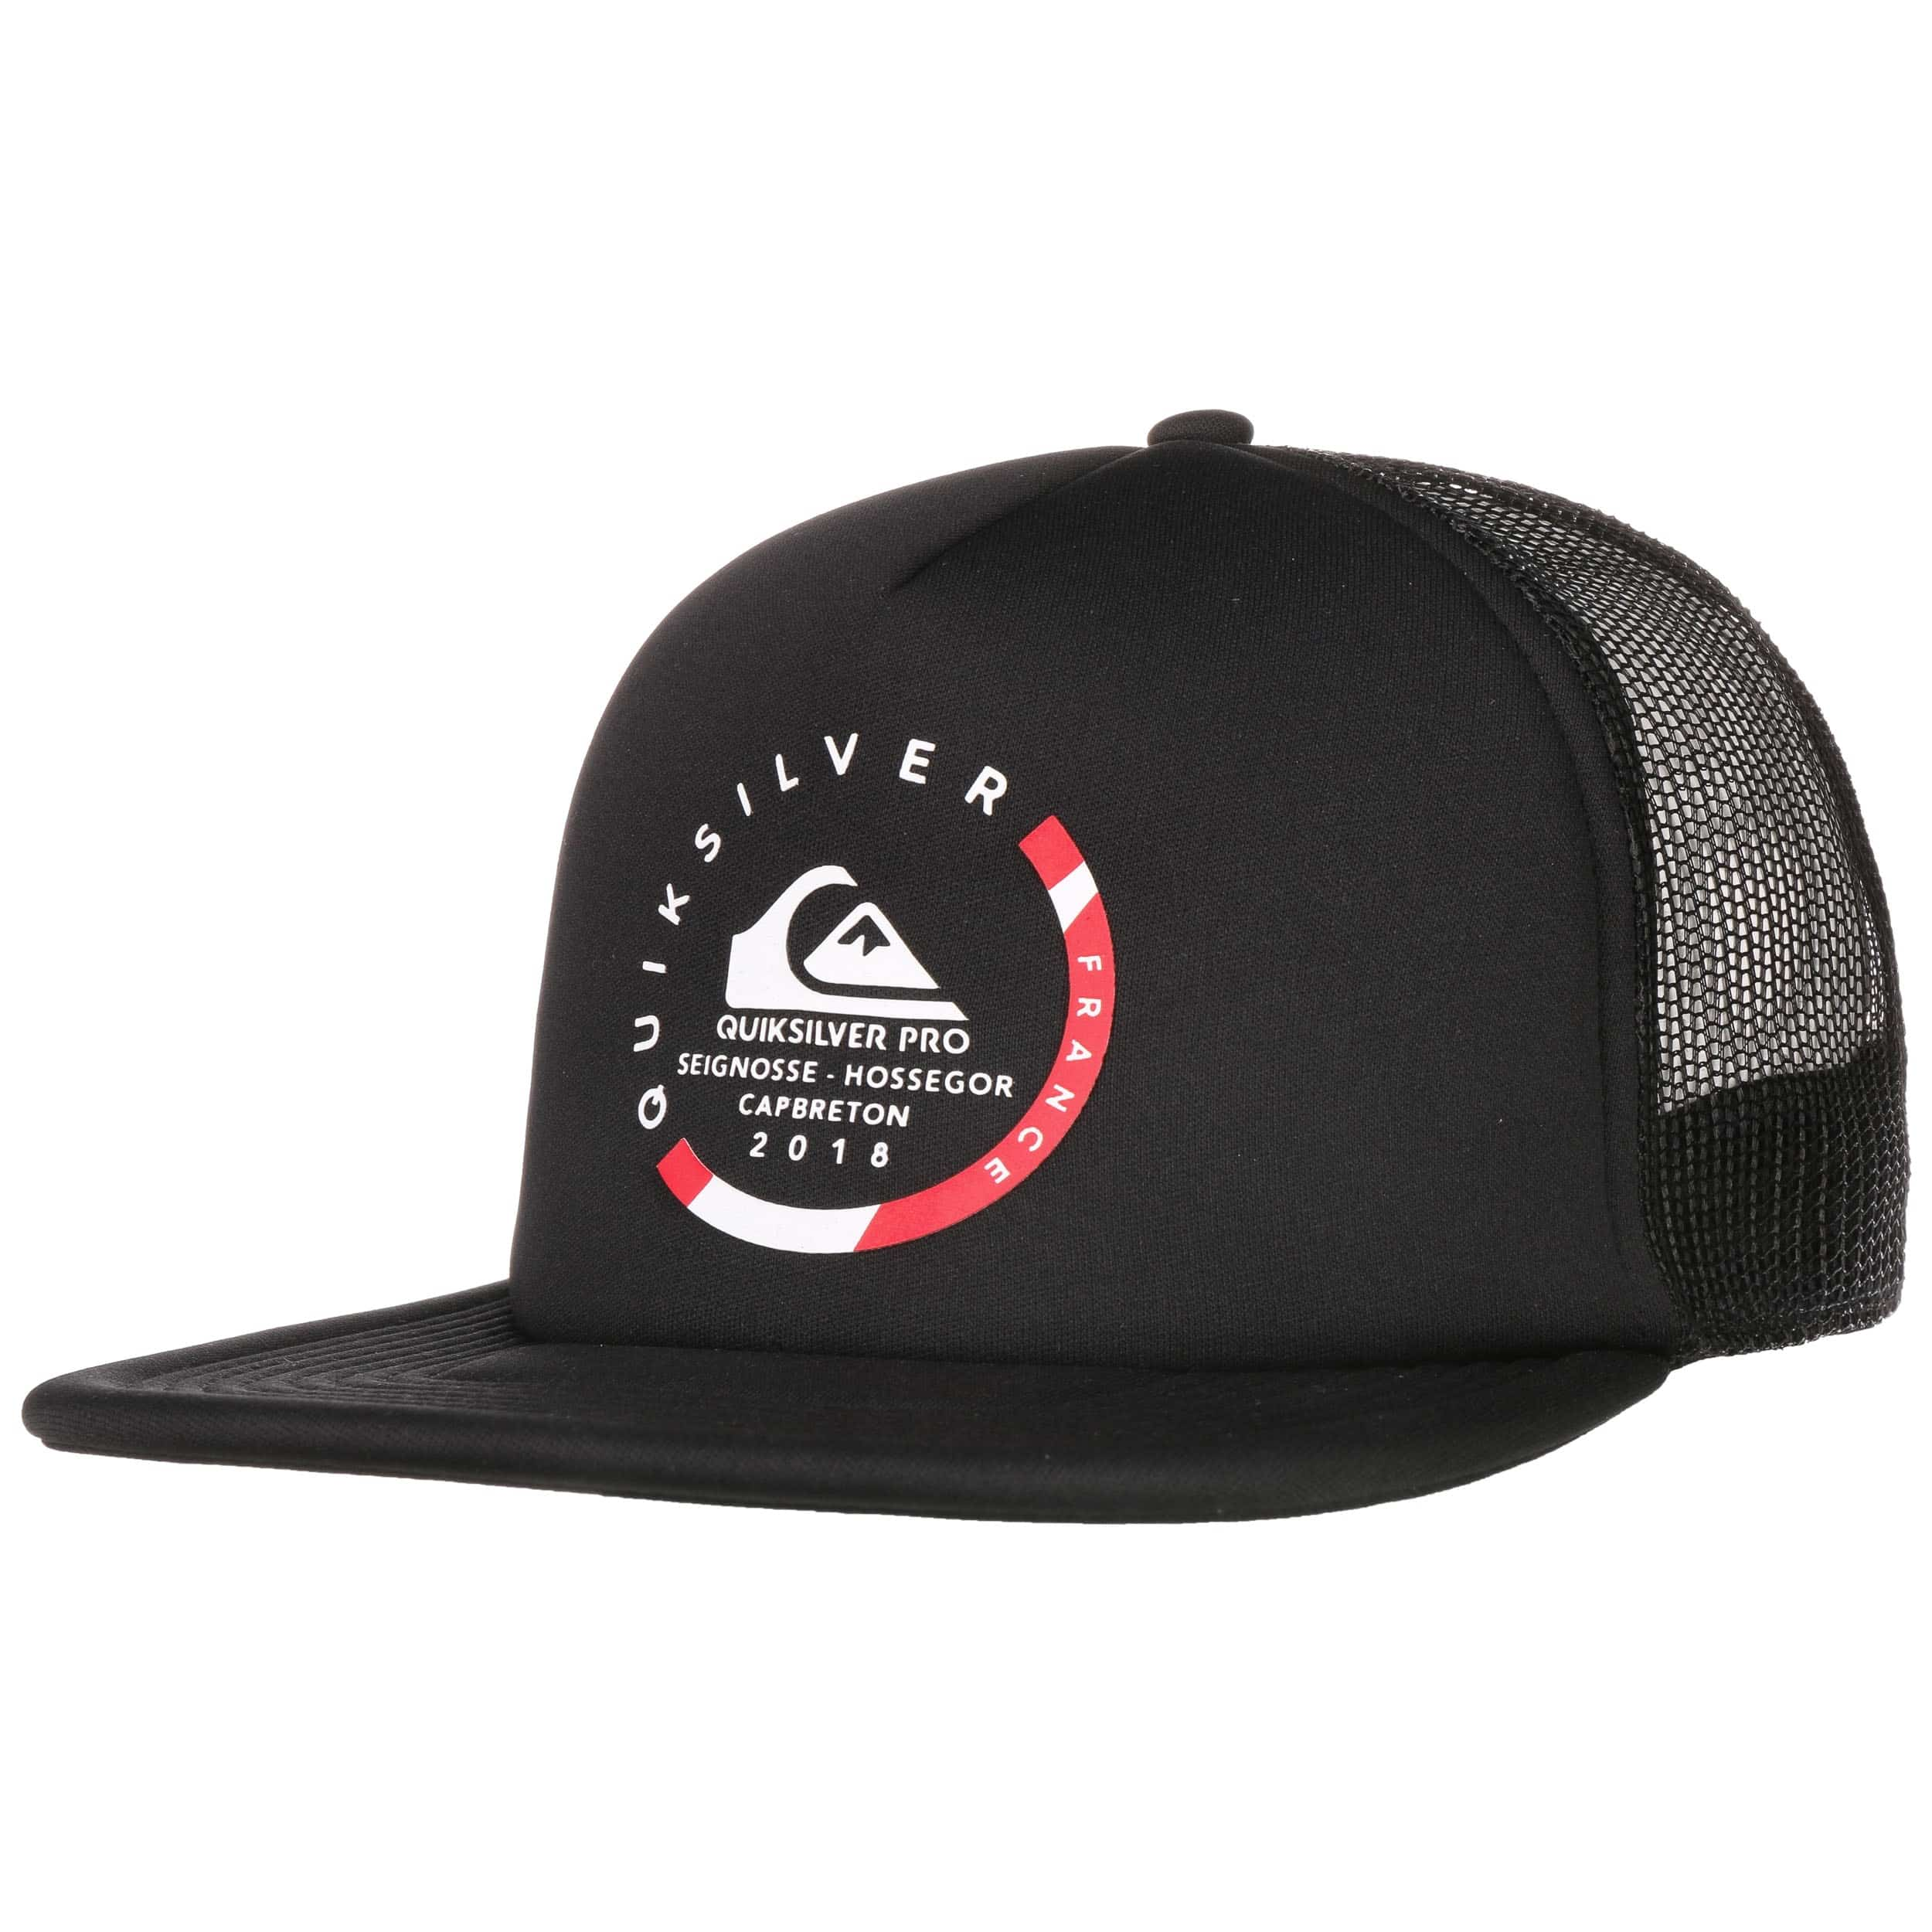 Quik pro france trucker cap quiksilver eur hats caps jpg 2500x2500 France  hat b88bad871fac